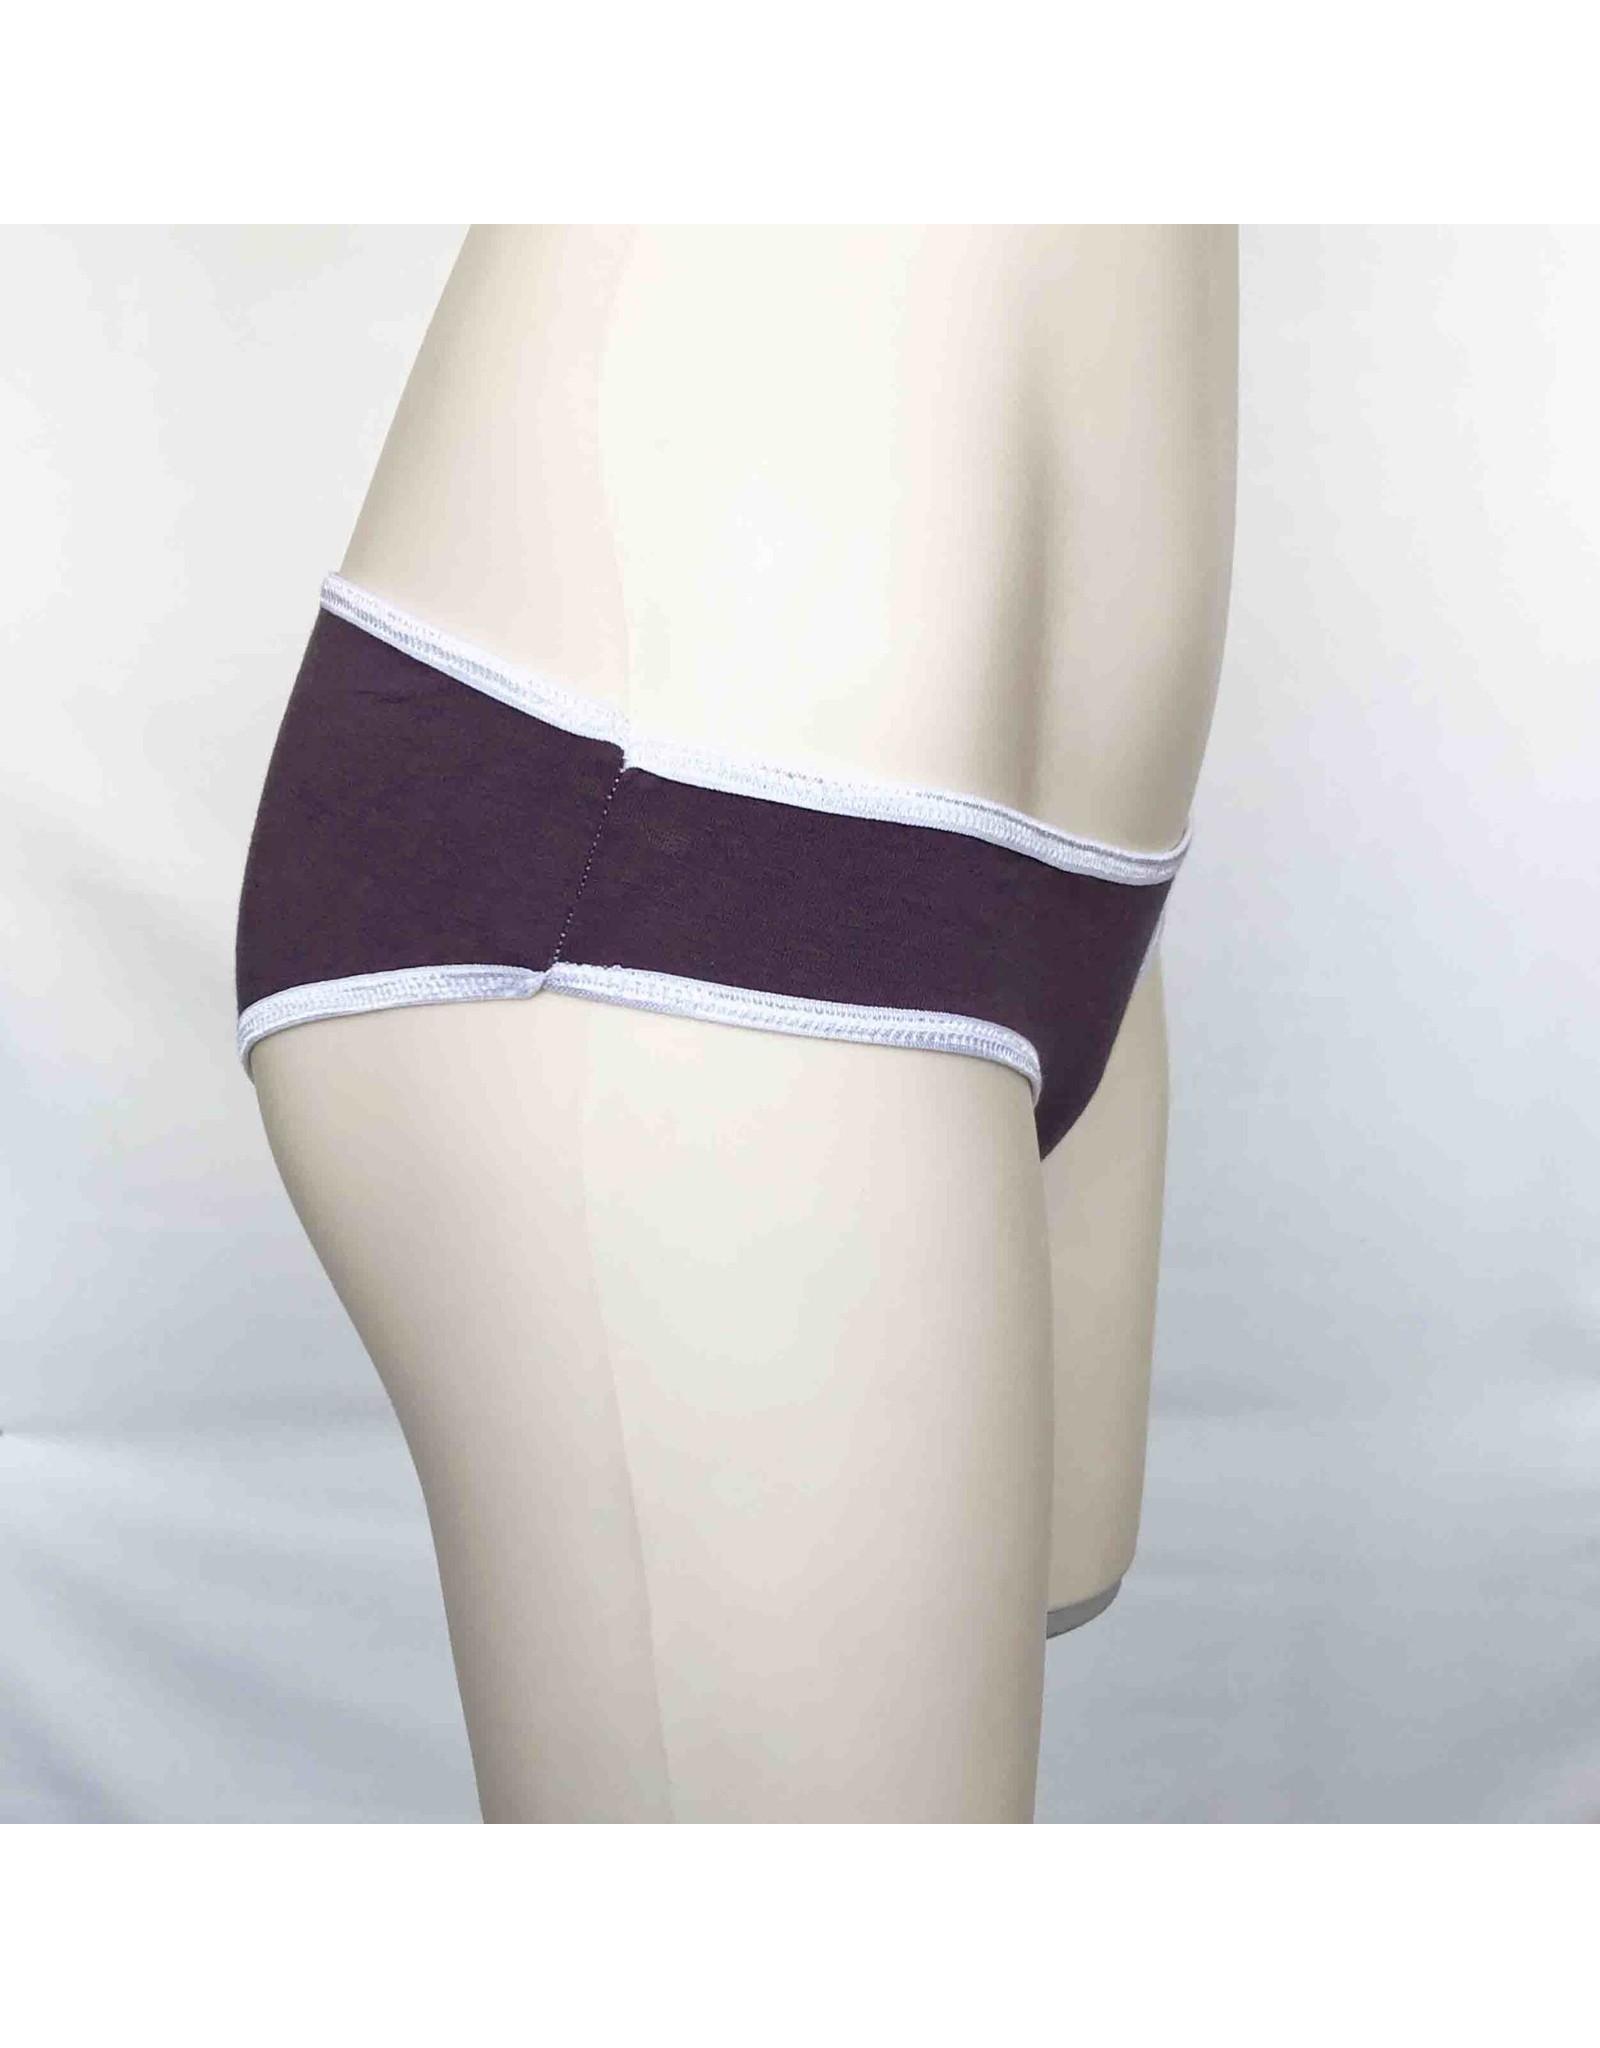 Devil May Wear Basic Bikini Cut Underwear. Bamboo Blend. Flint